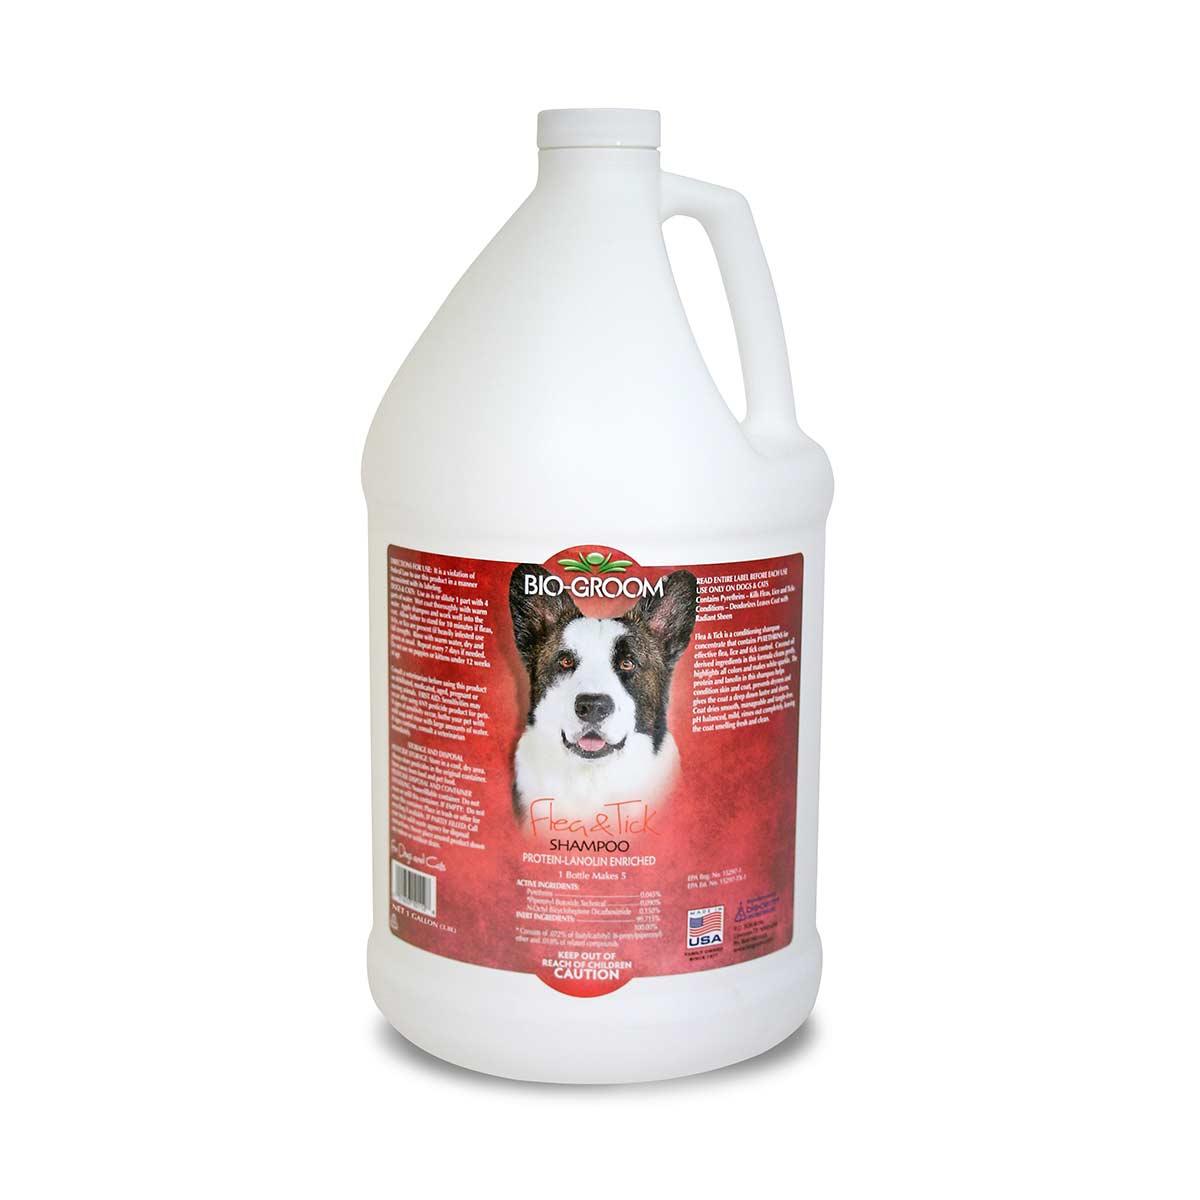 Bio-Groom Flea & Tick Dog Shampoo Gallon 4:1